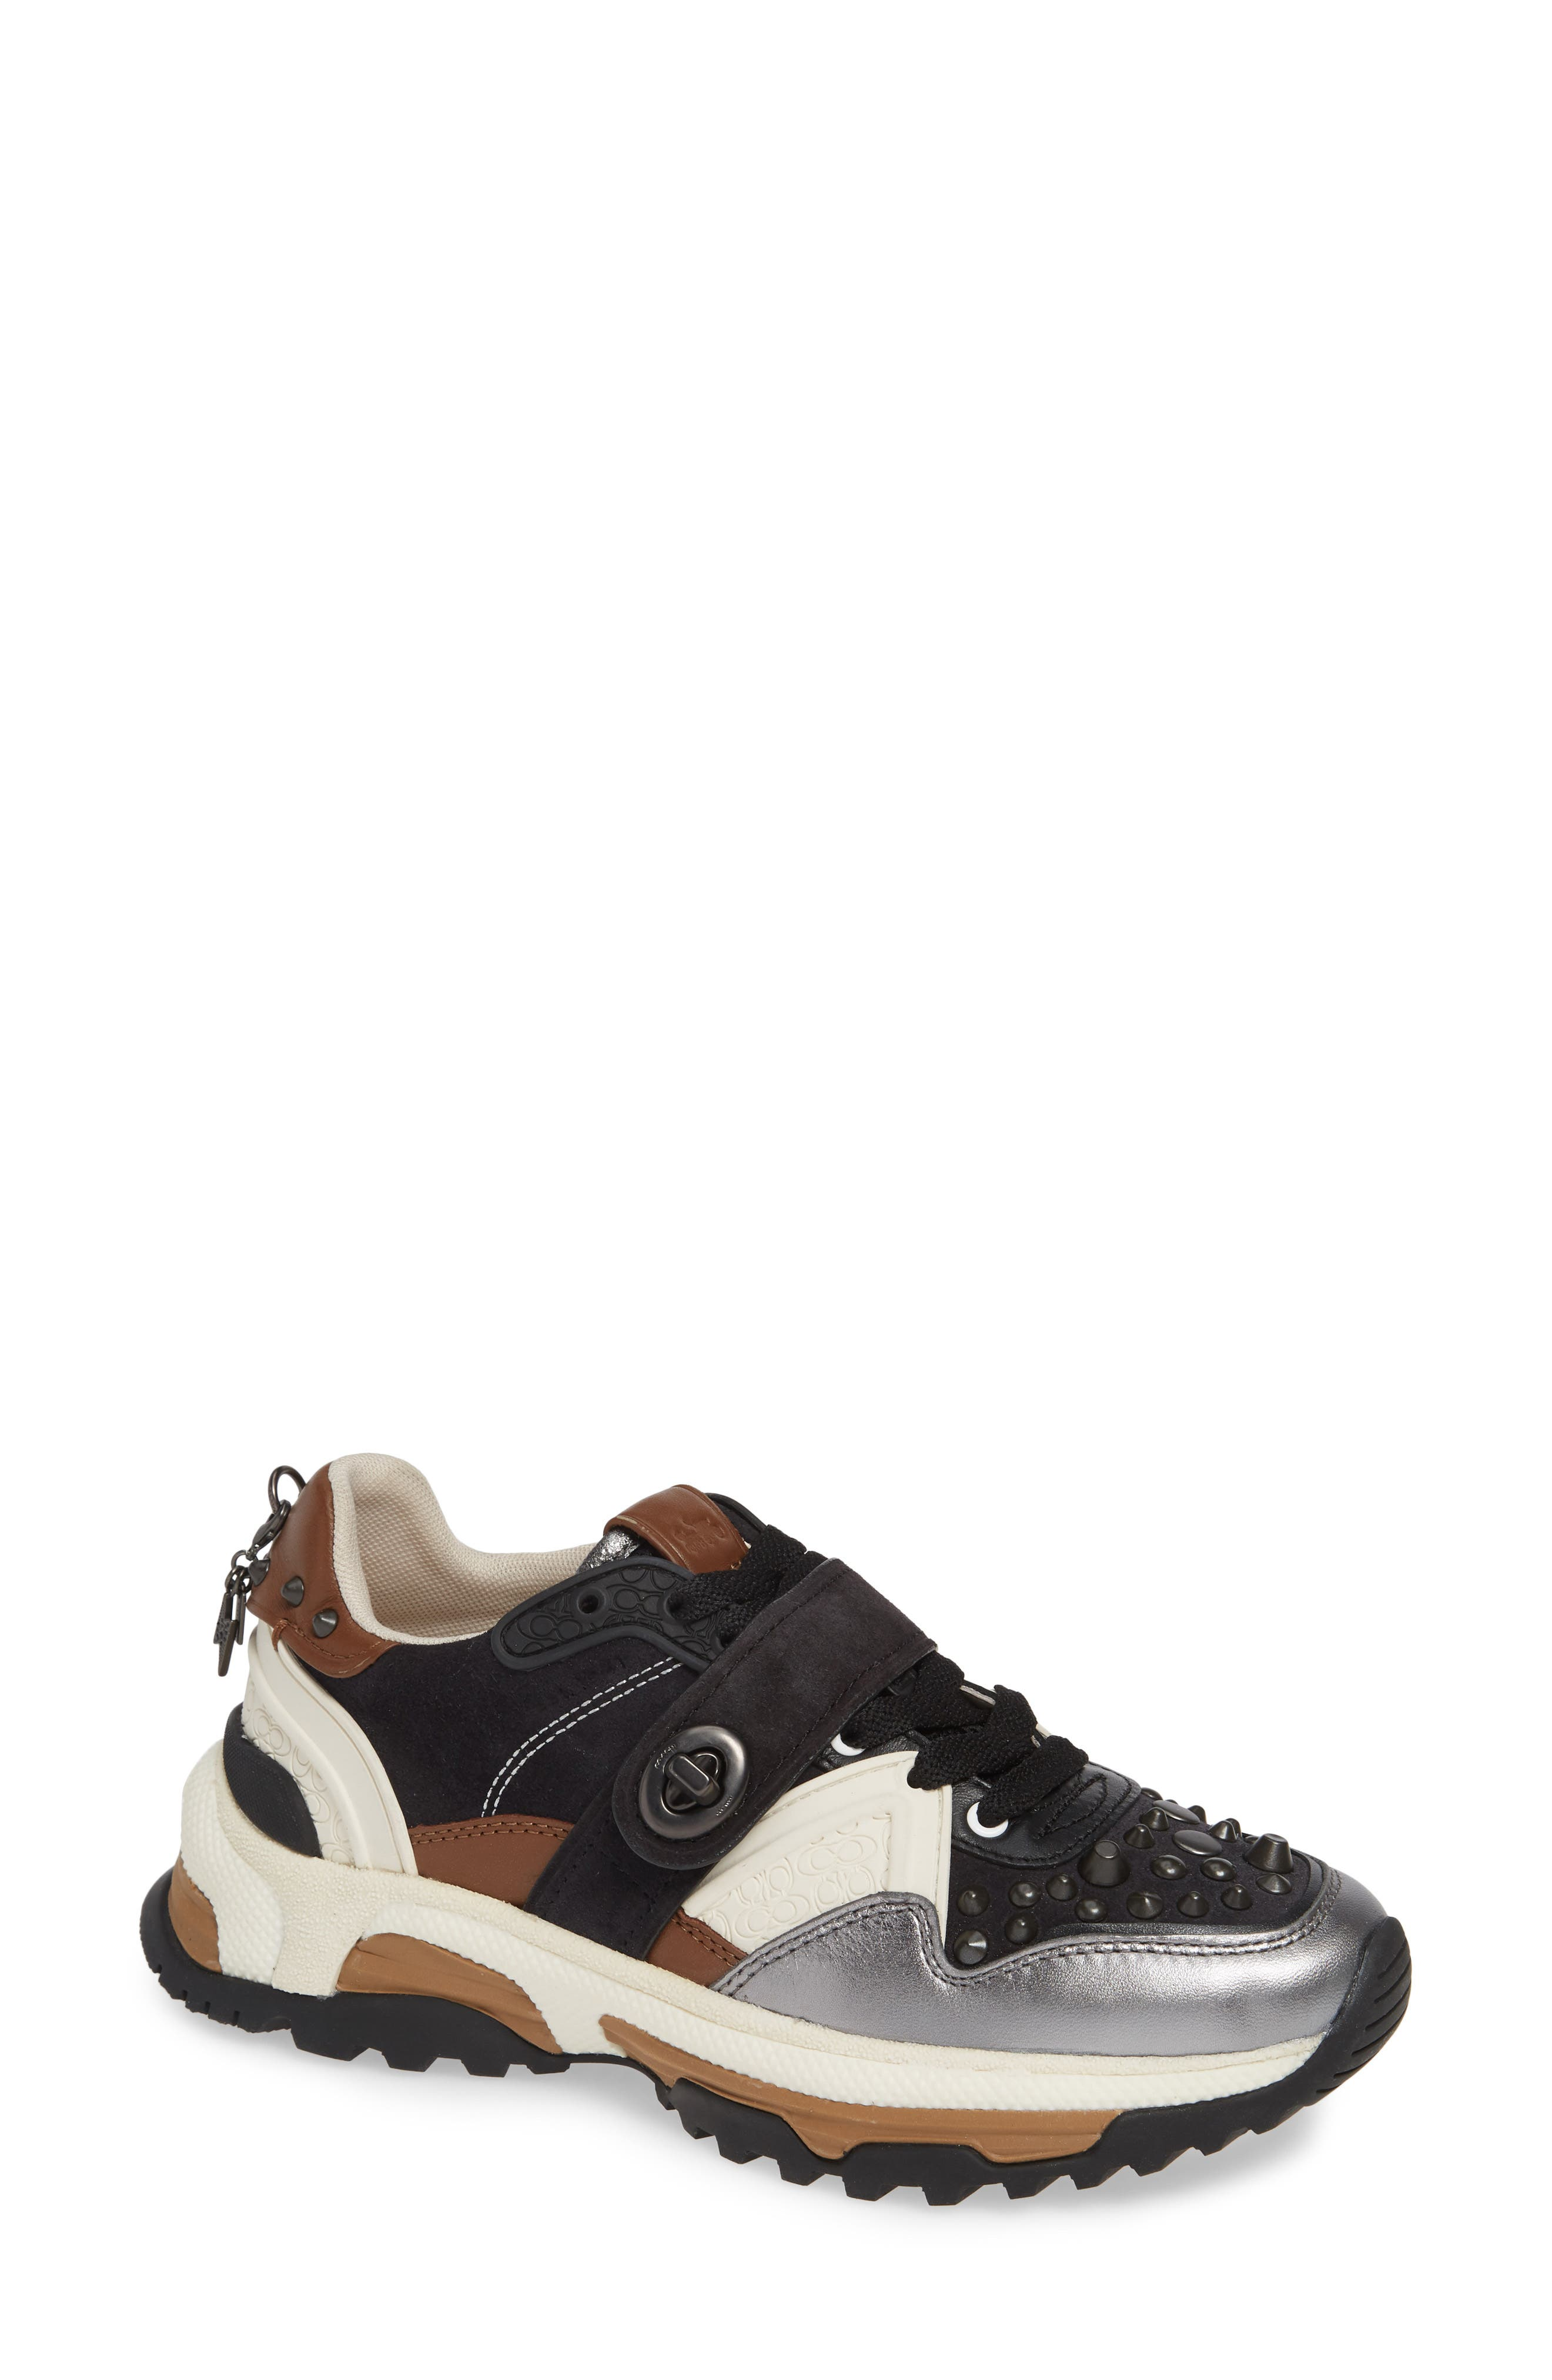 C143 Studded Sneaker, Main, color, BLACK/ GUNMETAL LEATHER